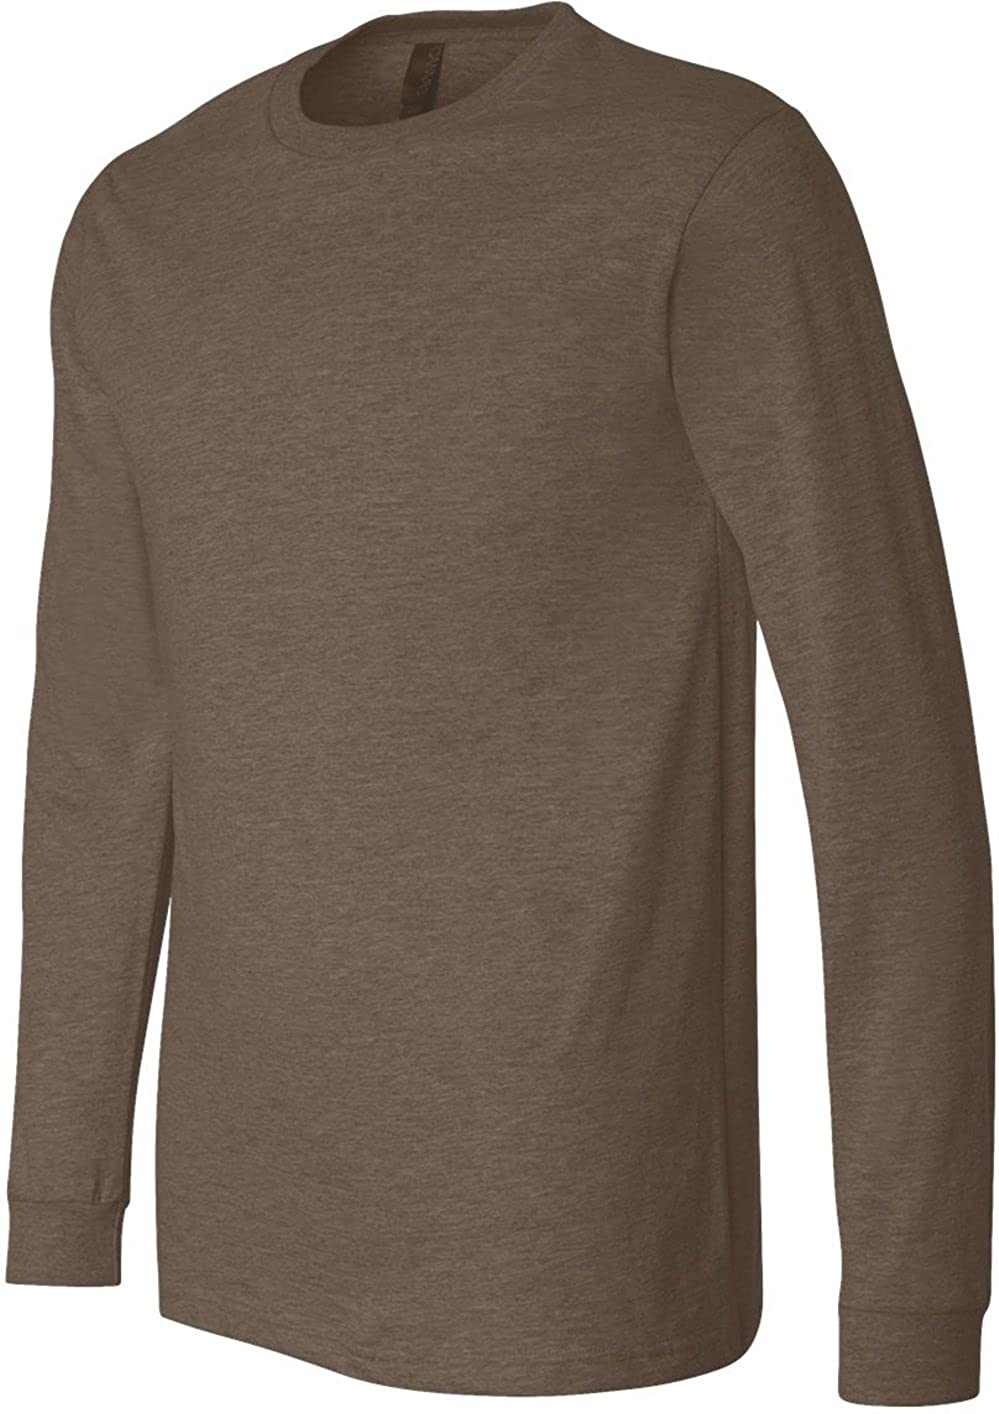 Bella + Canvasメンズジャージー長袖TシャツTシャツ(3501 ) B003MS462U XX-Large|ヘザーブラウン ヘザーブラウン XX-Large